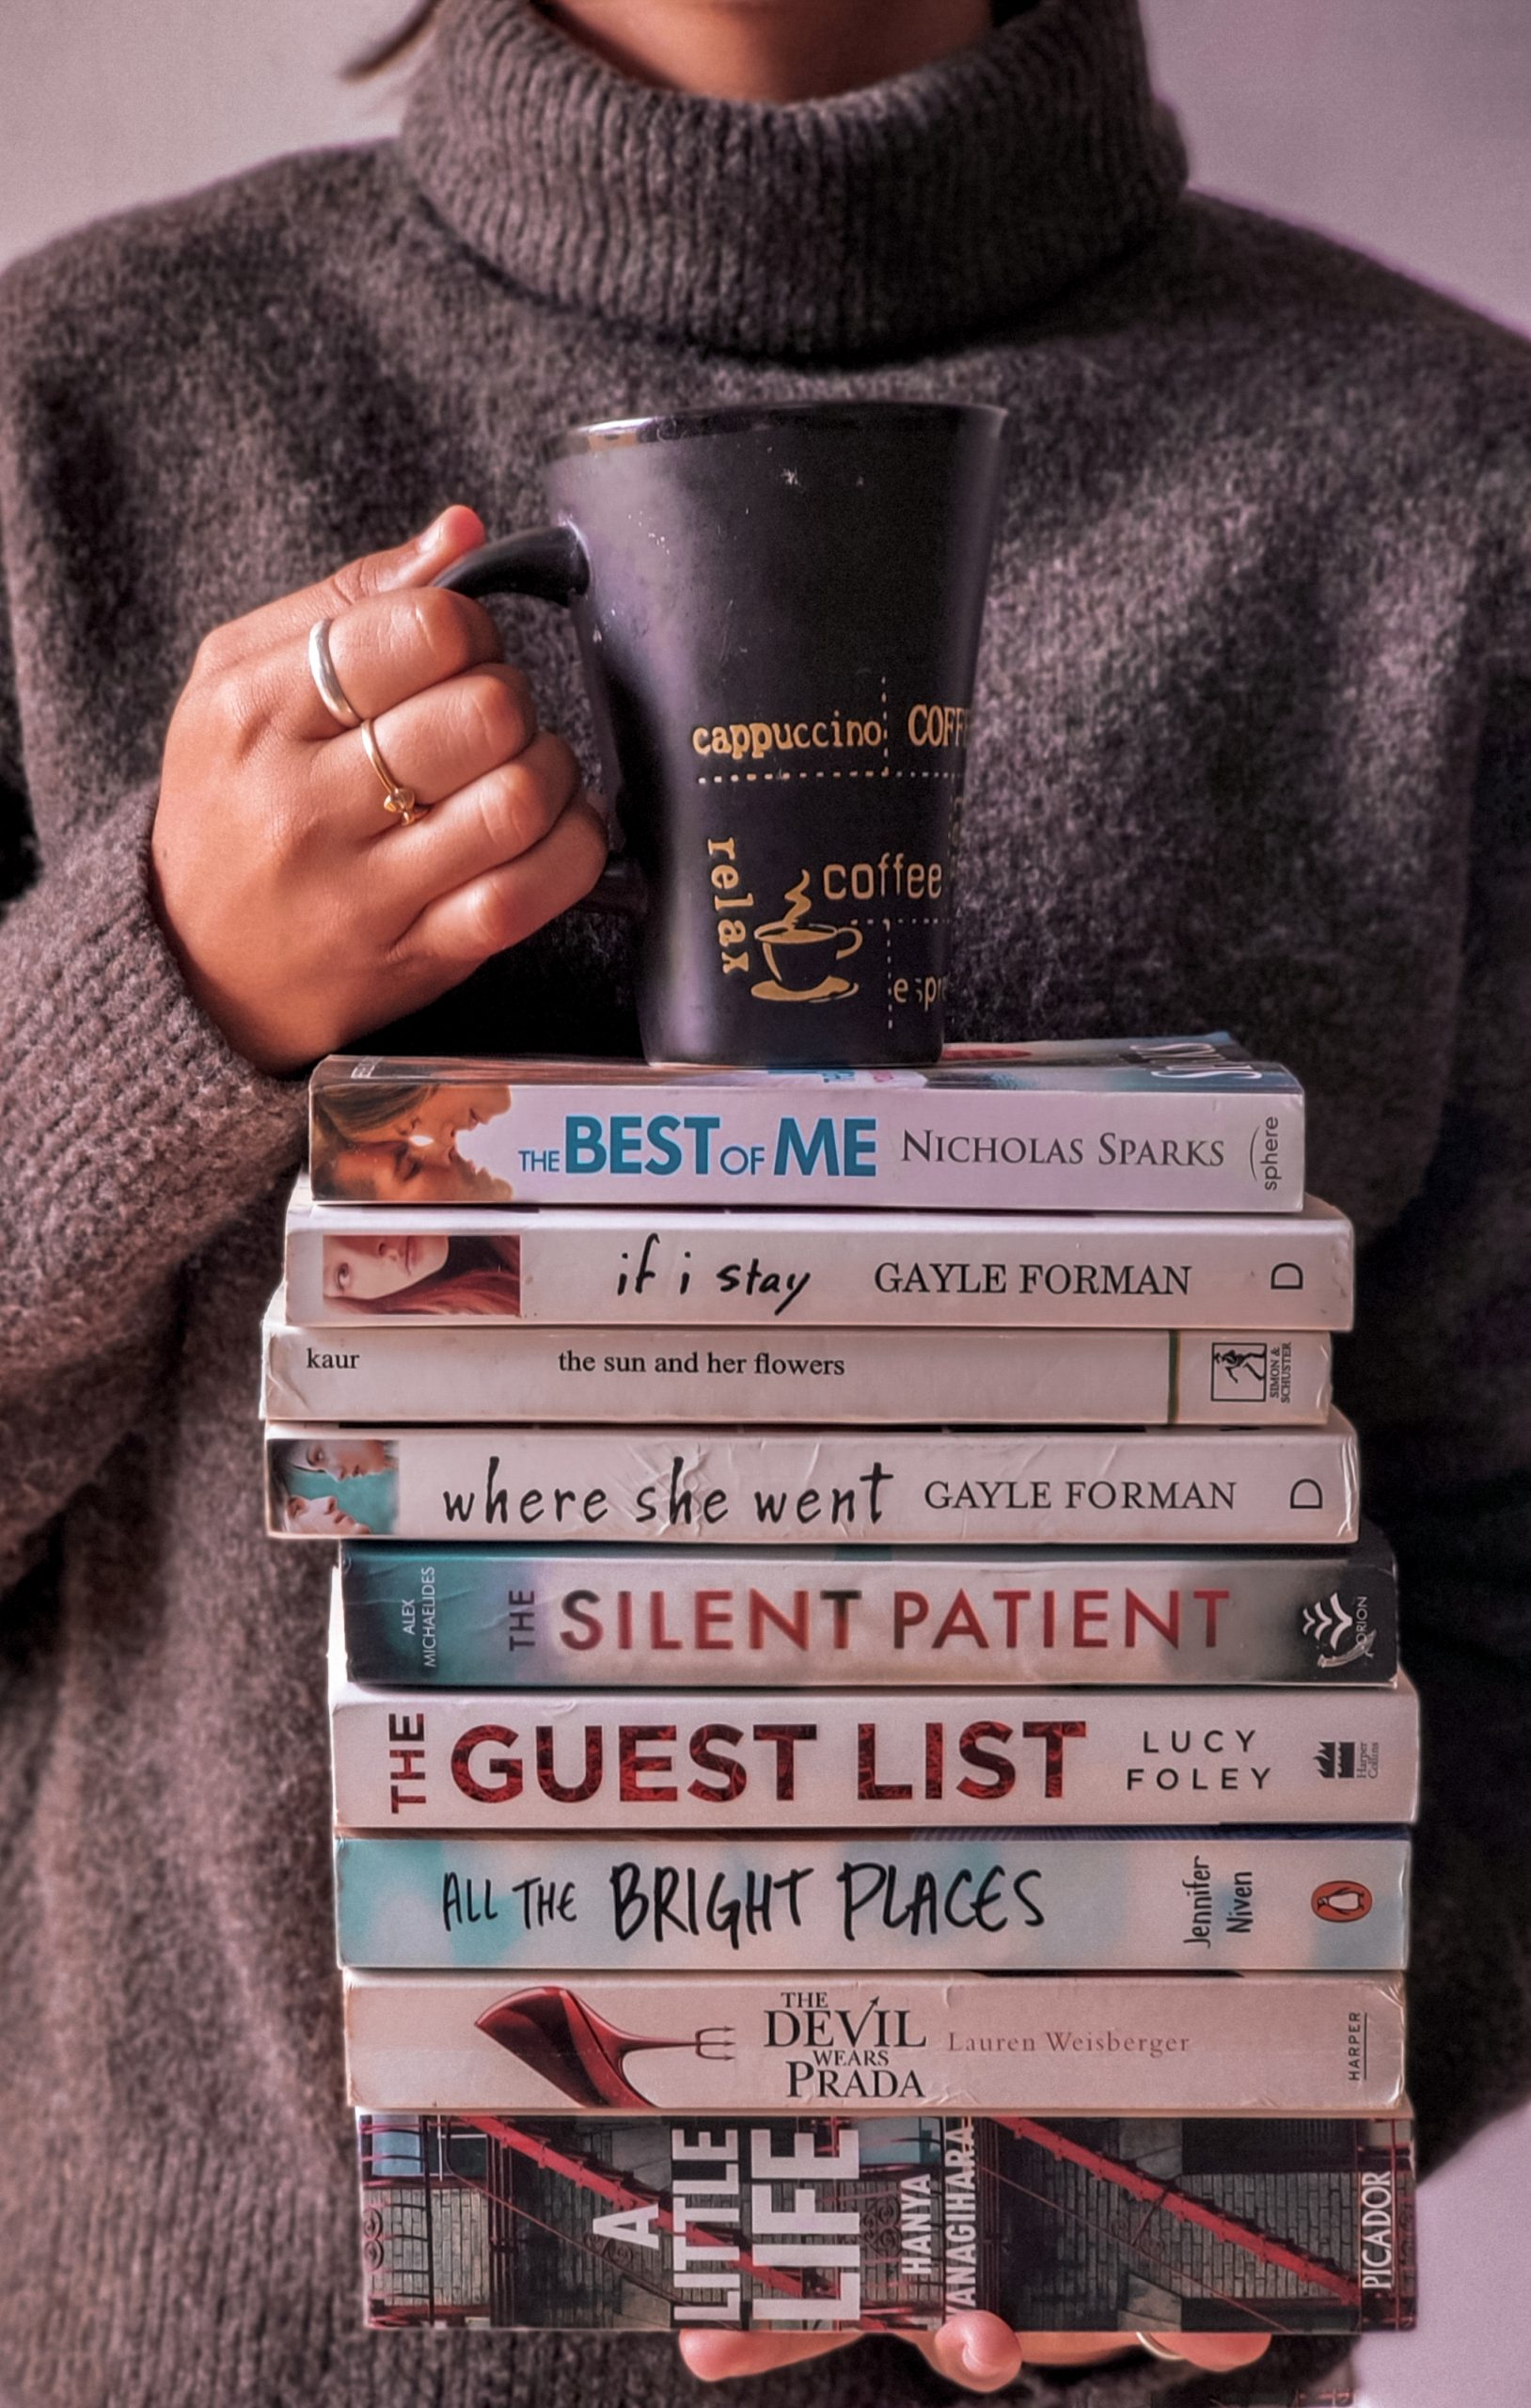 books and coffee mug in hand